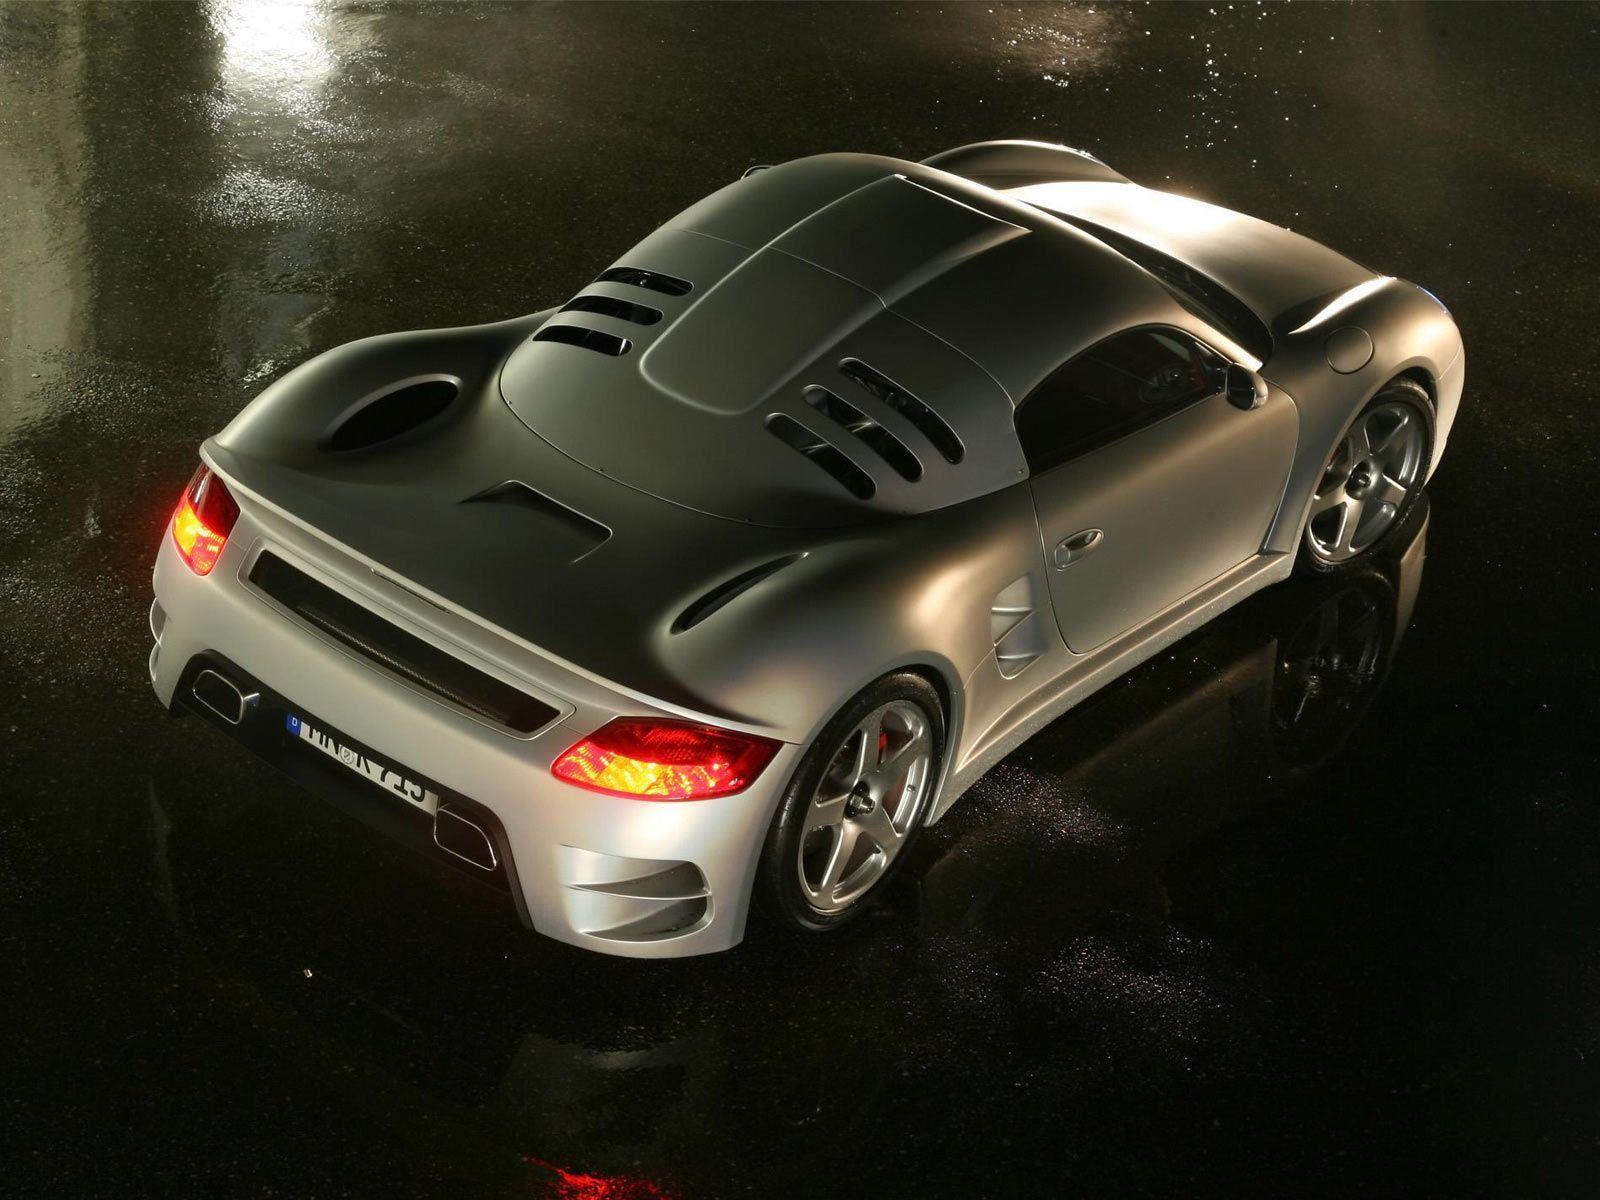 Windows 7 Sport Car Images Hd Wallpaper 4k In 2020 Porsche Car Car Wallpapers